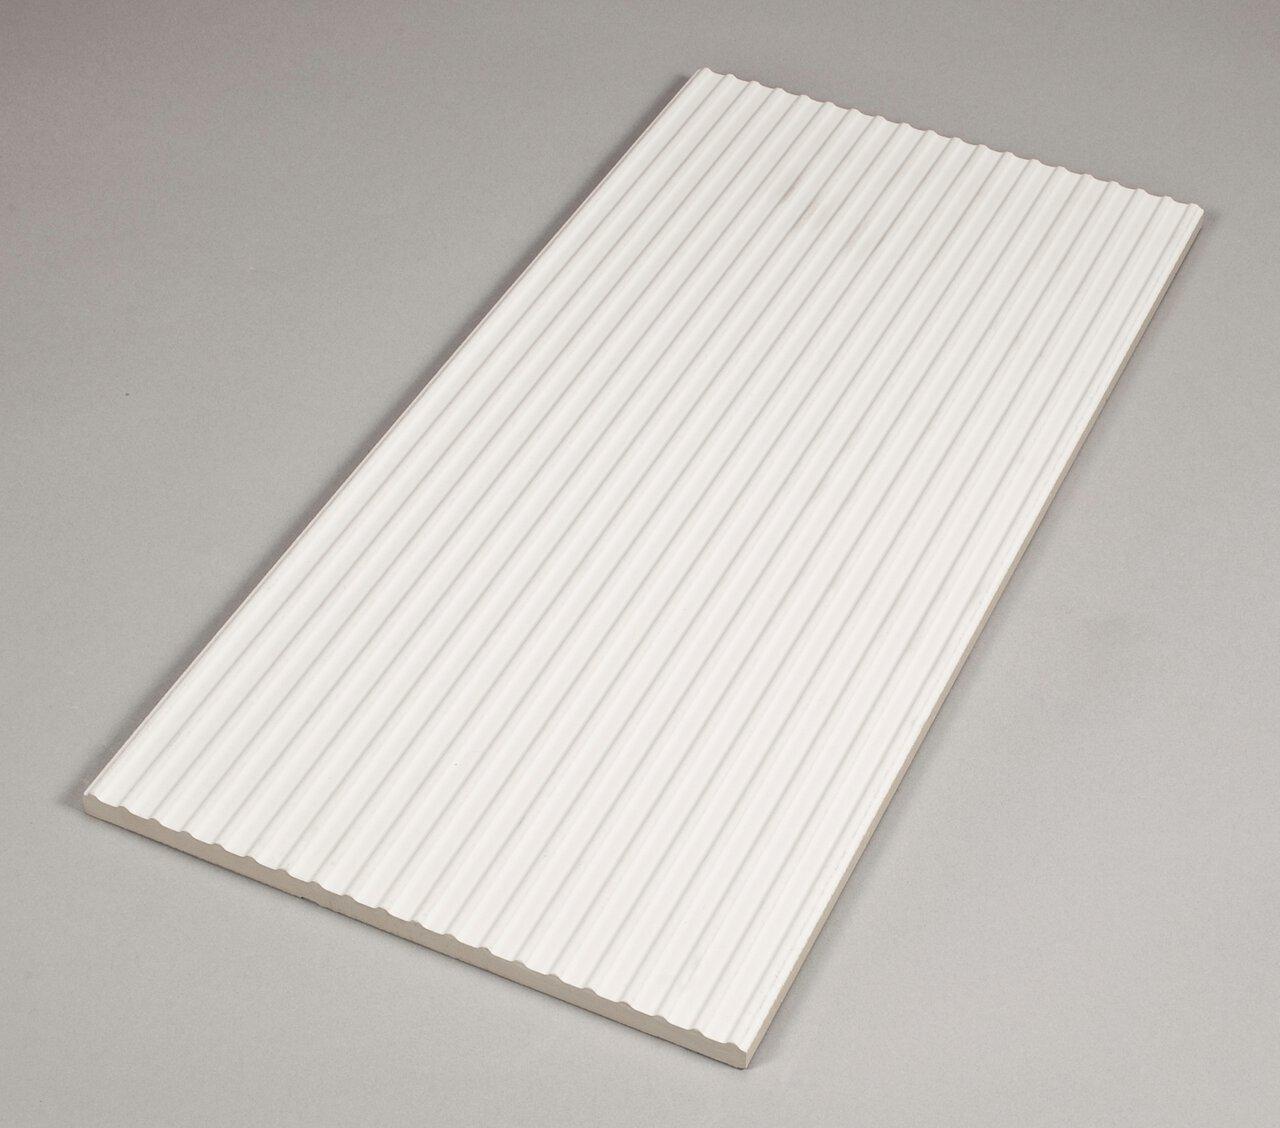 Рифленая плитка 494x244x12.5 мм